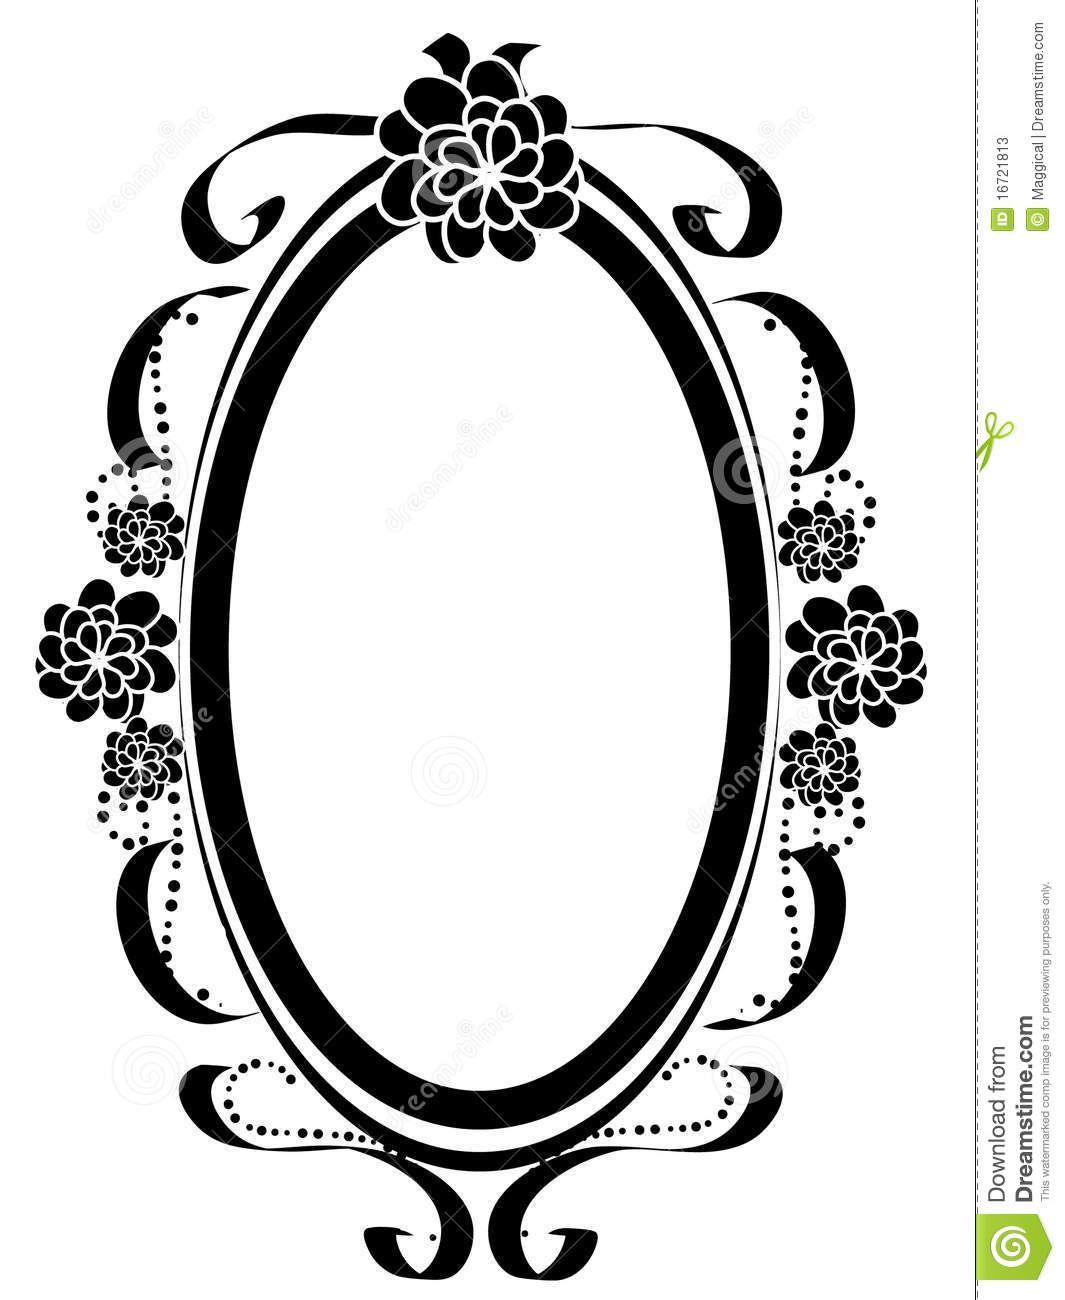 vintage oval frames vector - Pesquisa Google | Artesanato | Pinterest